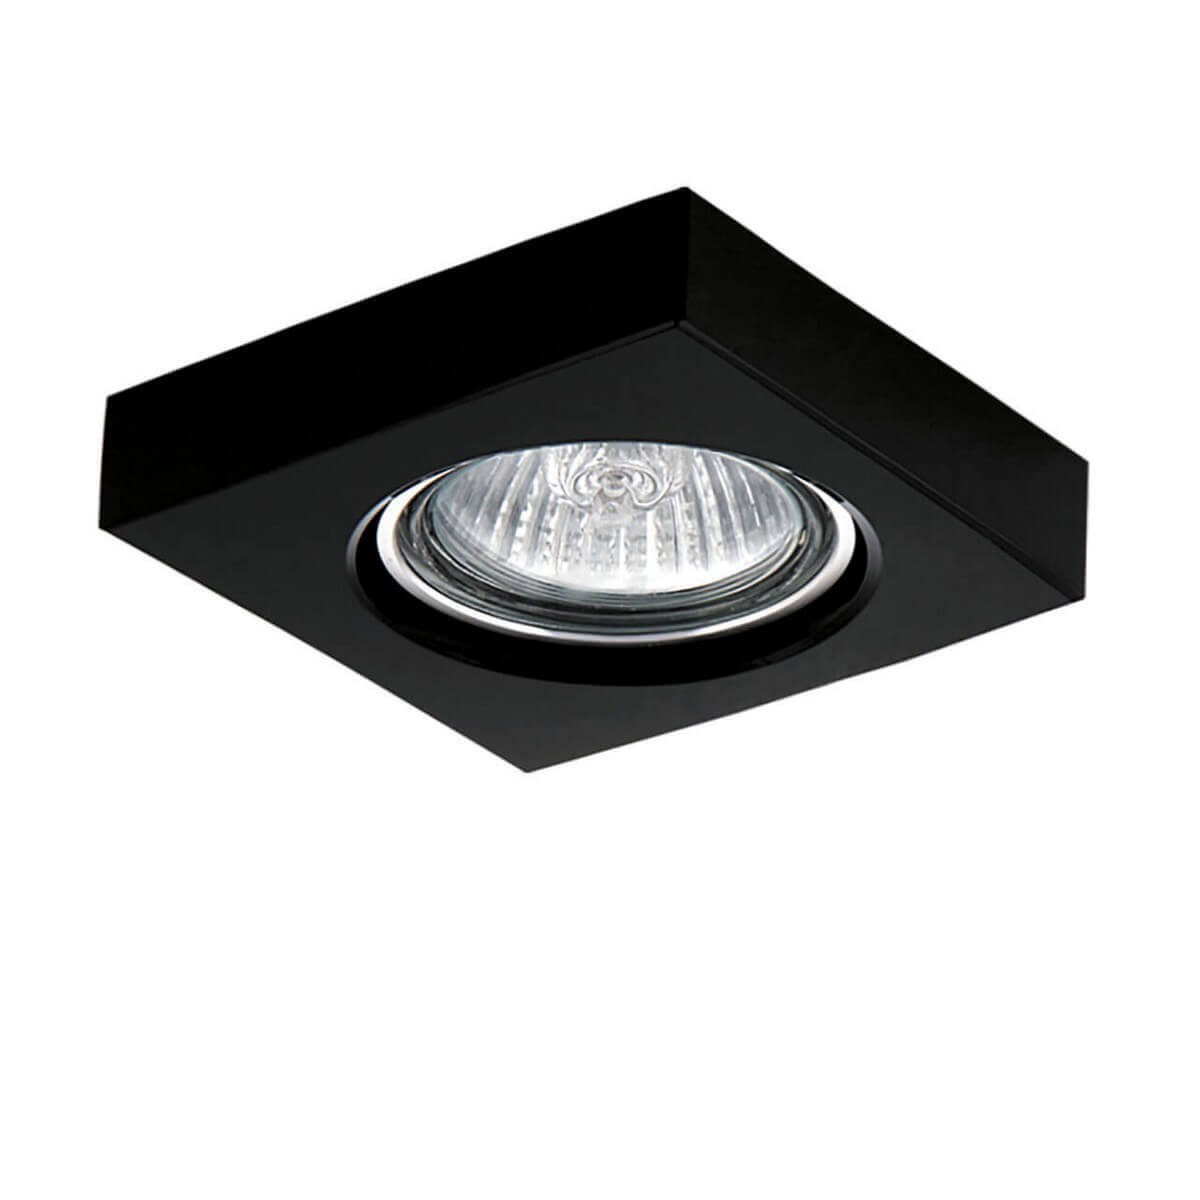 цена Светильник Lightstar 006167 Lui Micro онлайн в 2017 году